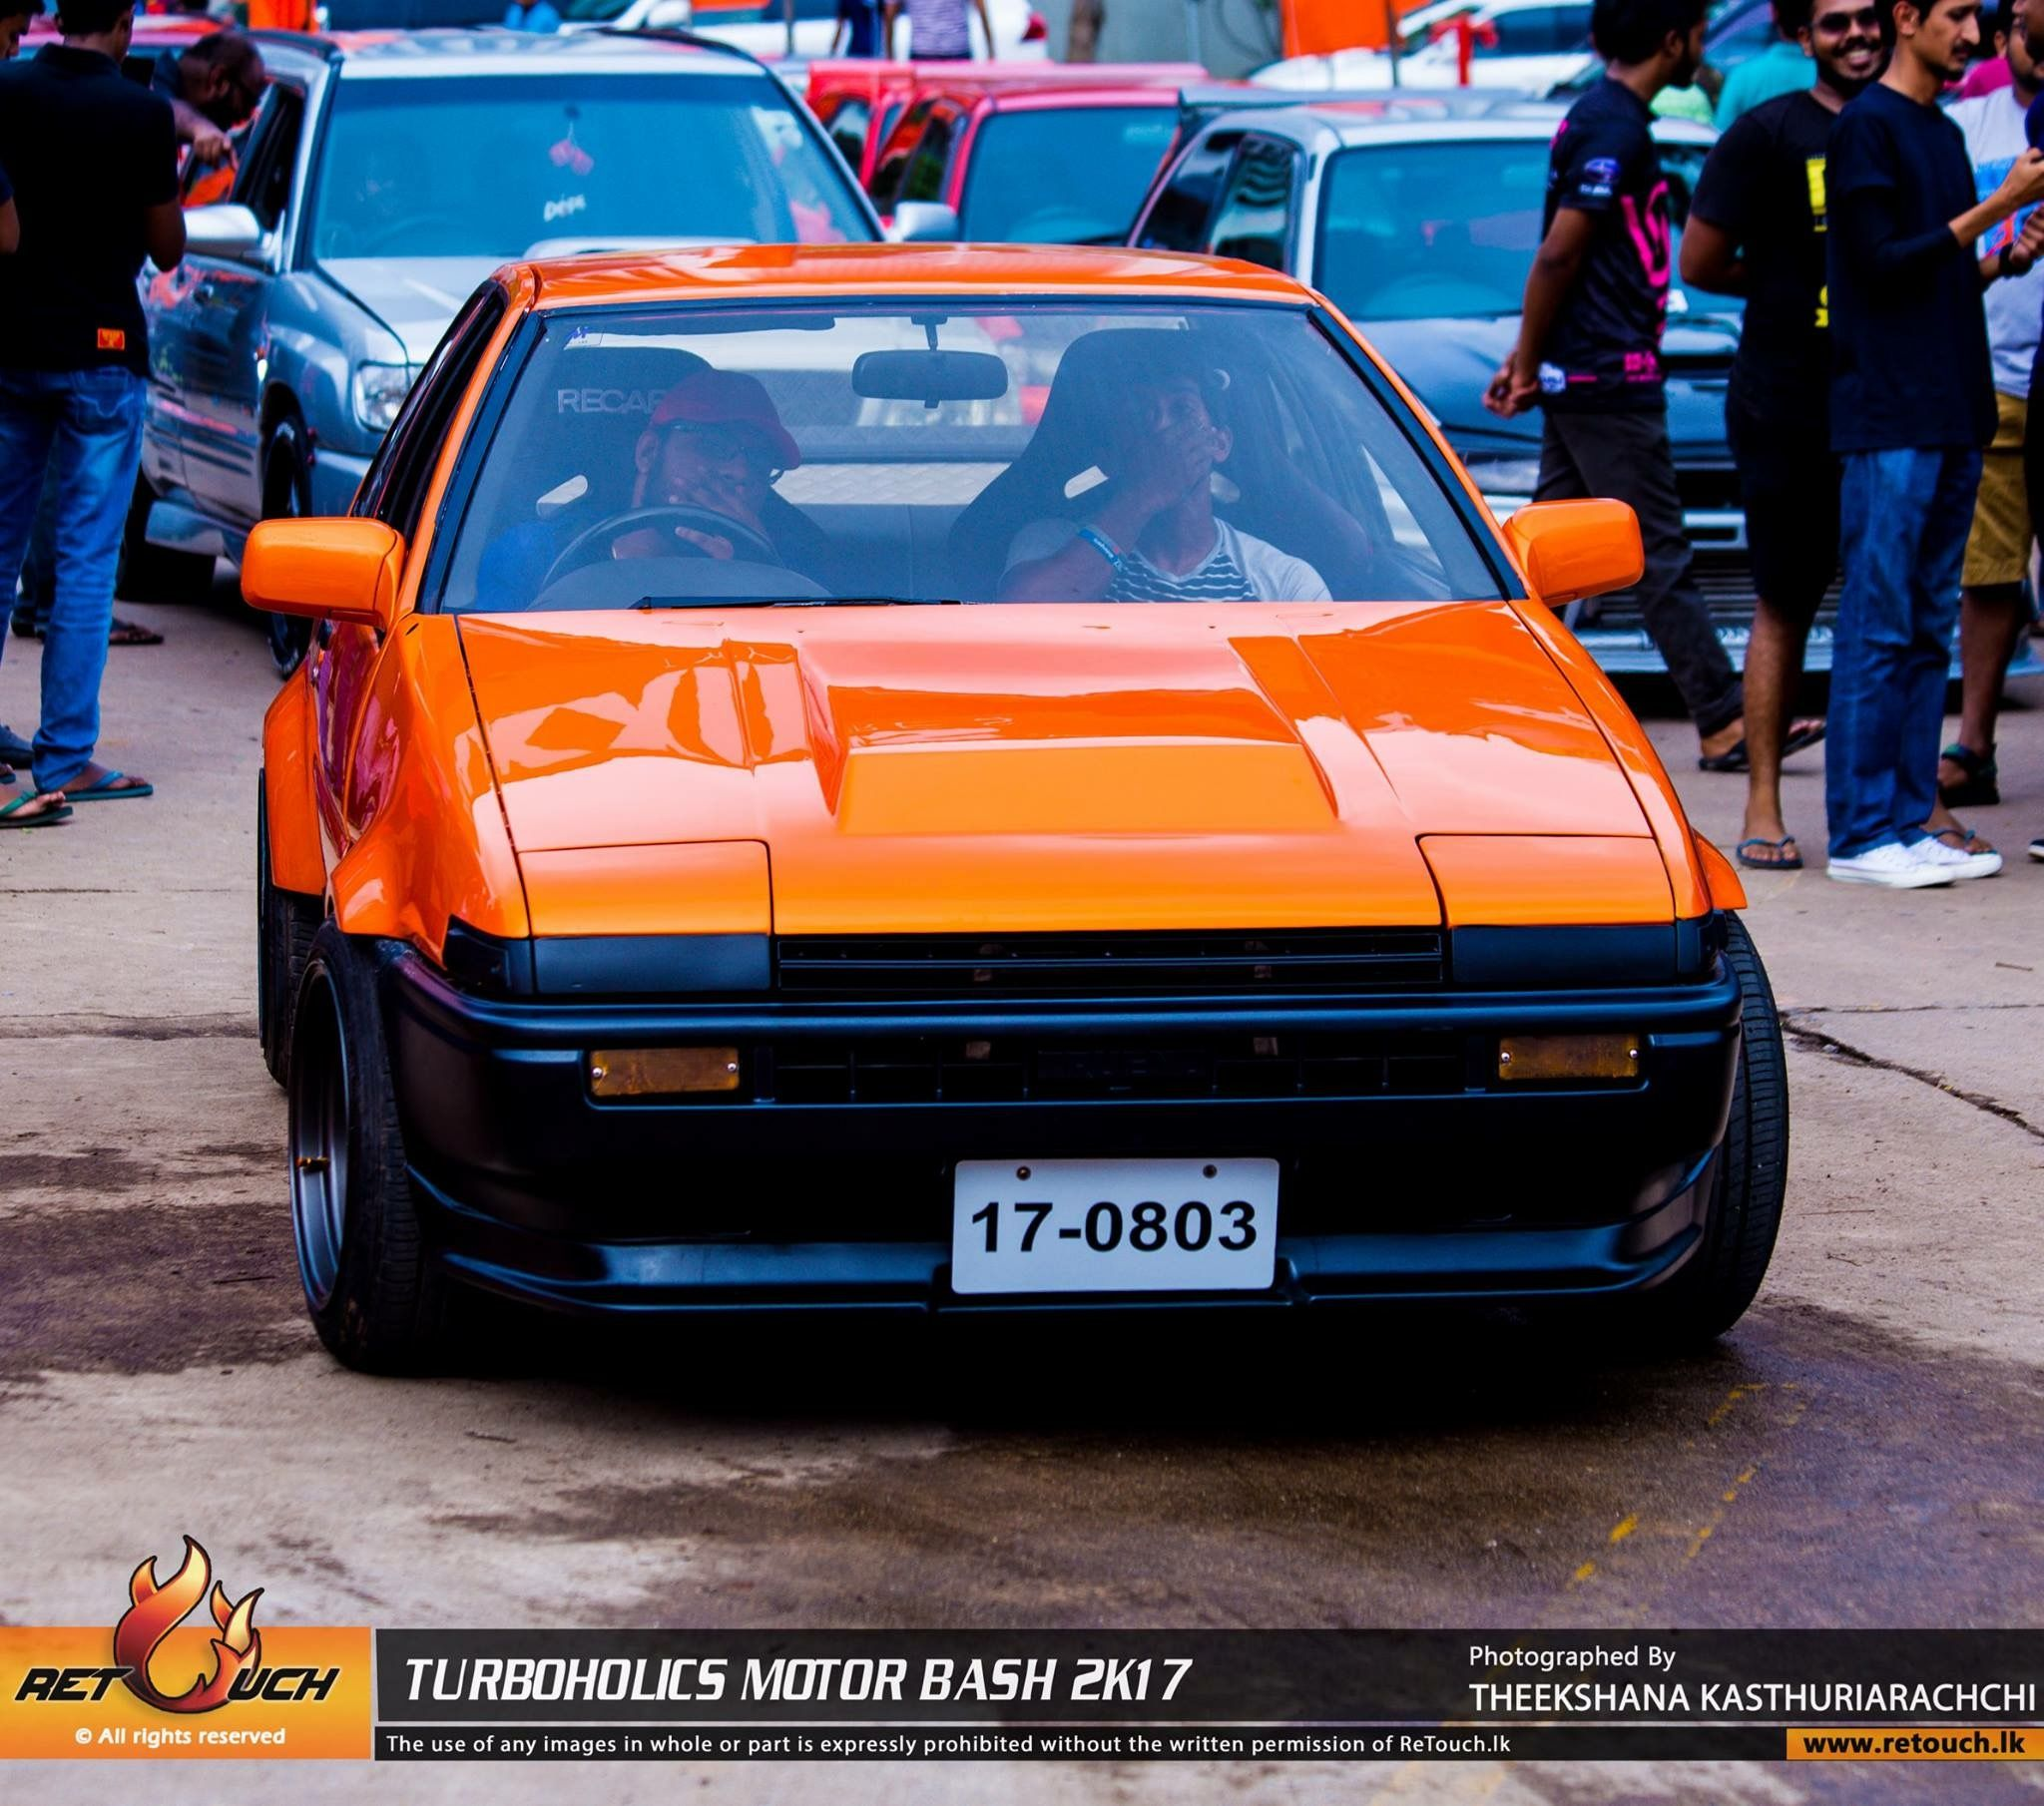 Ae86 hachiroku in srilanka with a sr20 engine